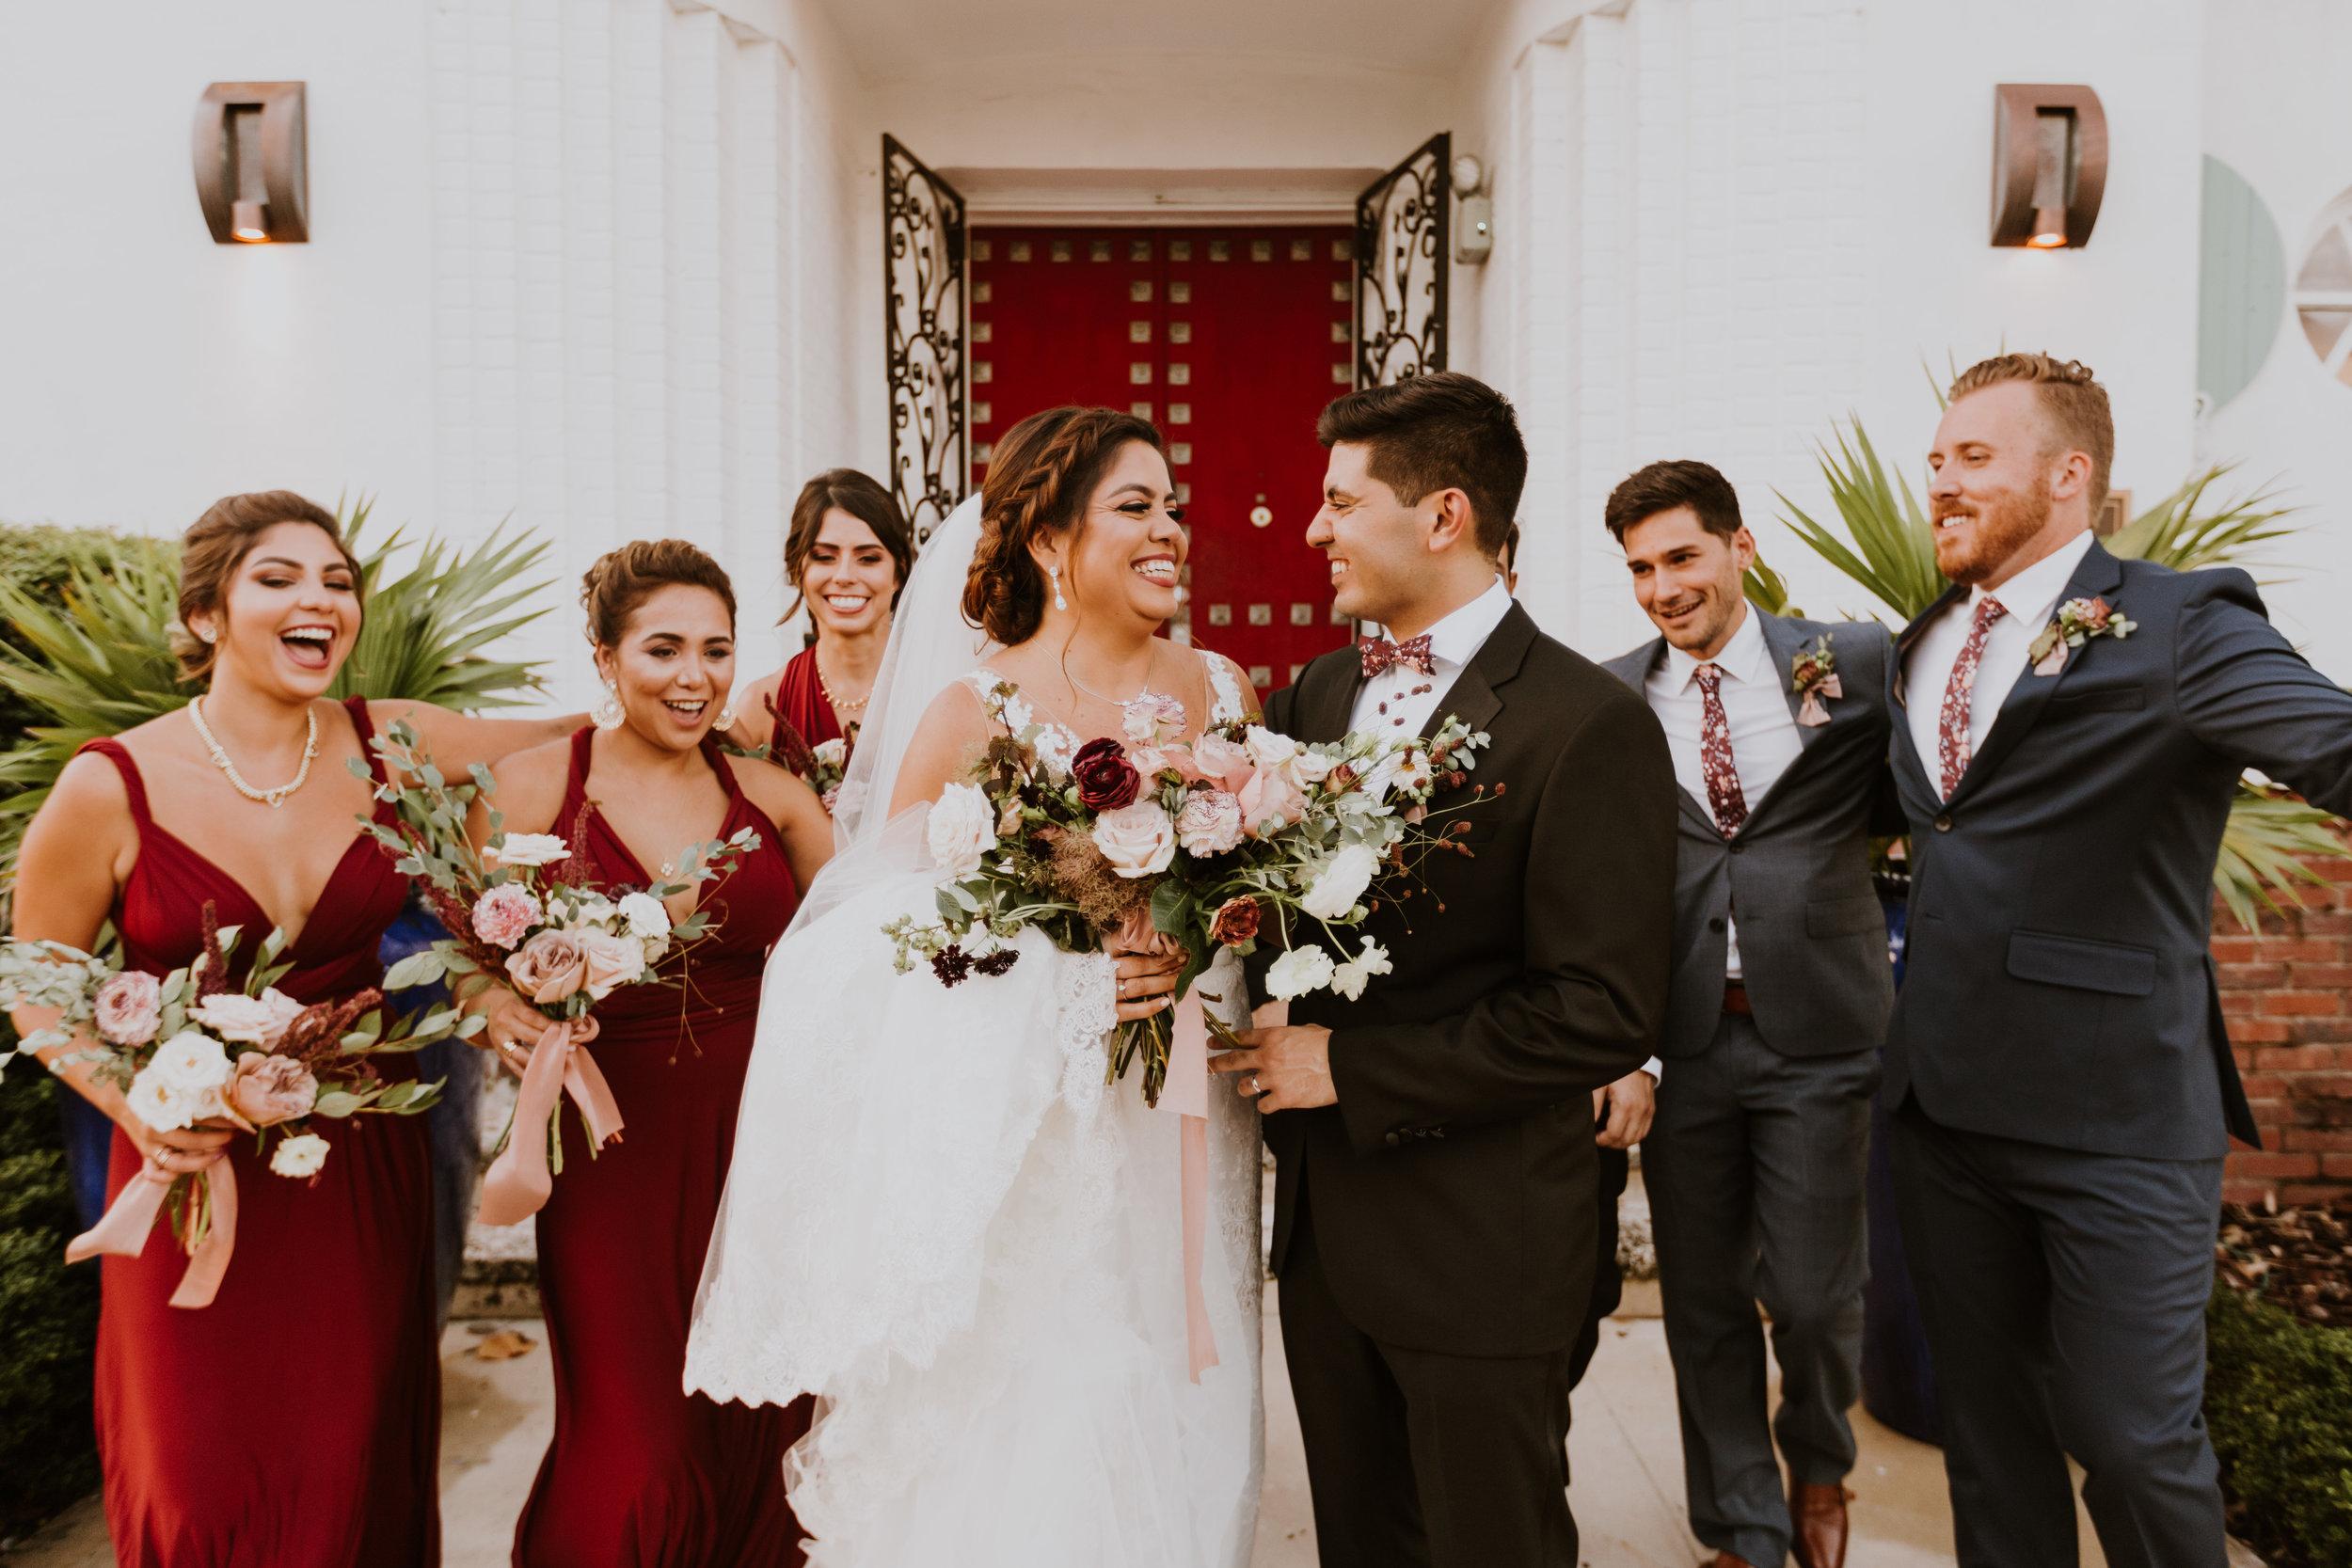 VinandKaren_Married-217.jpg